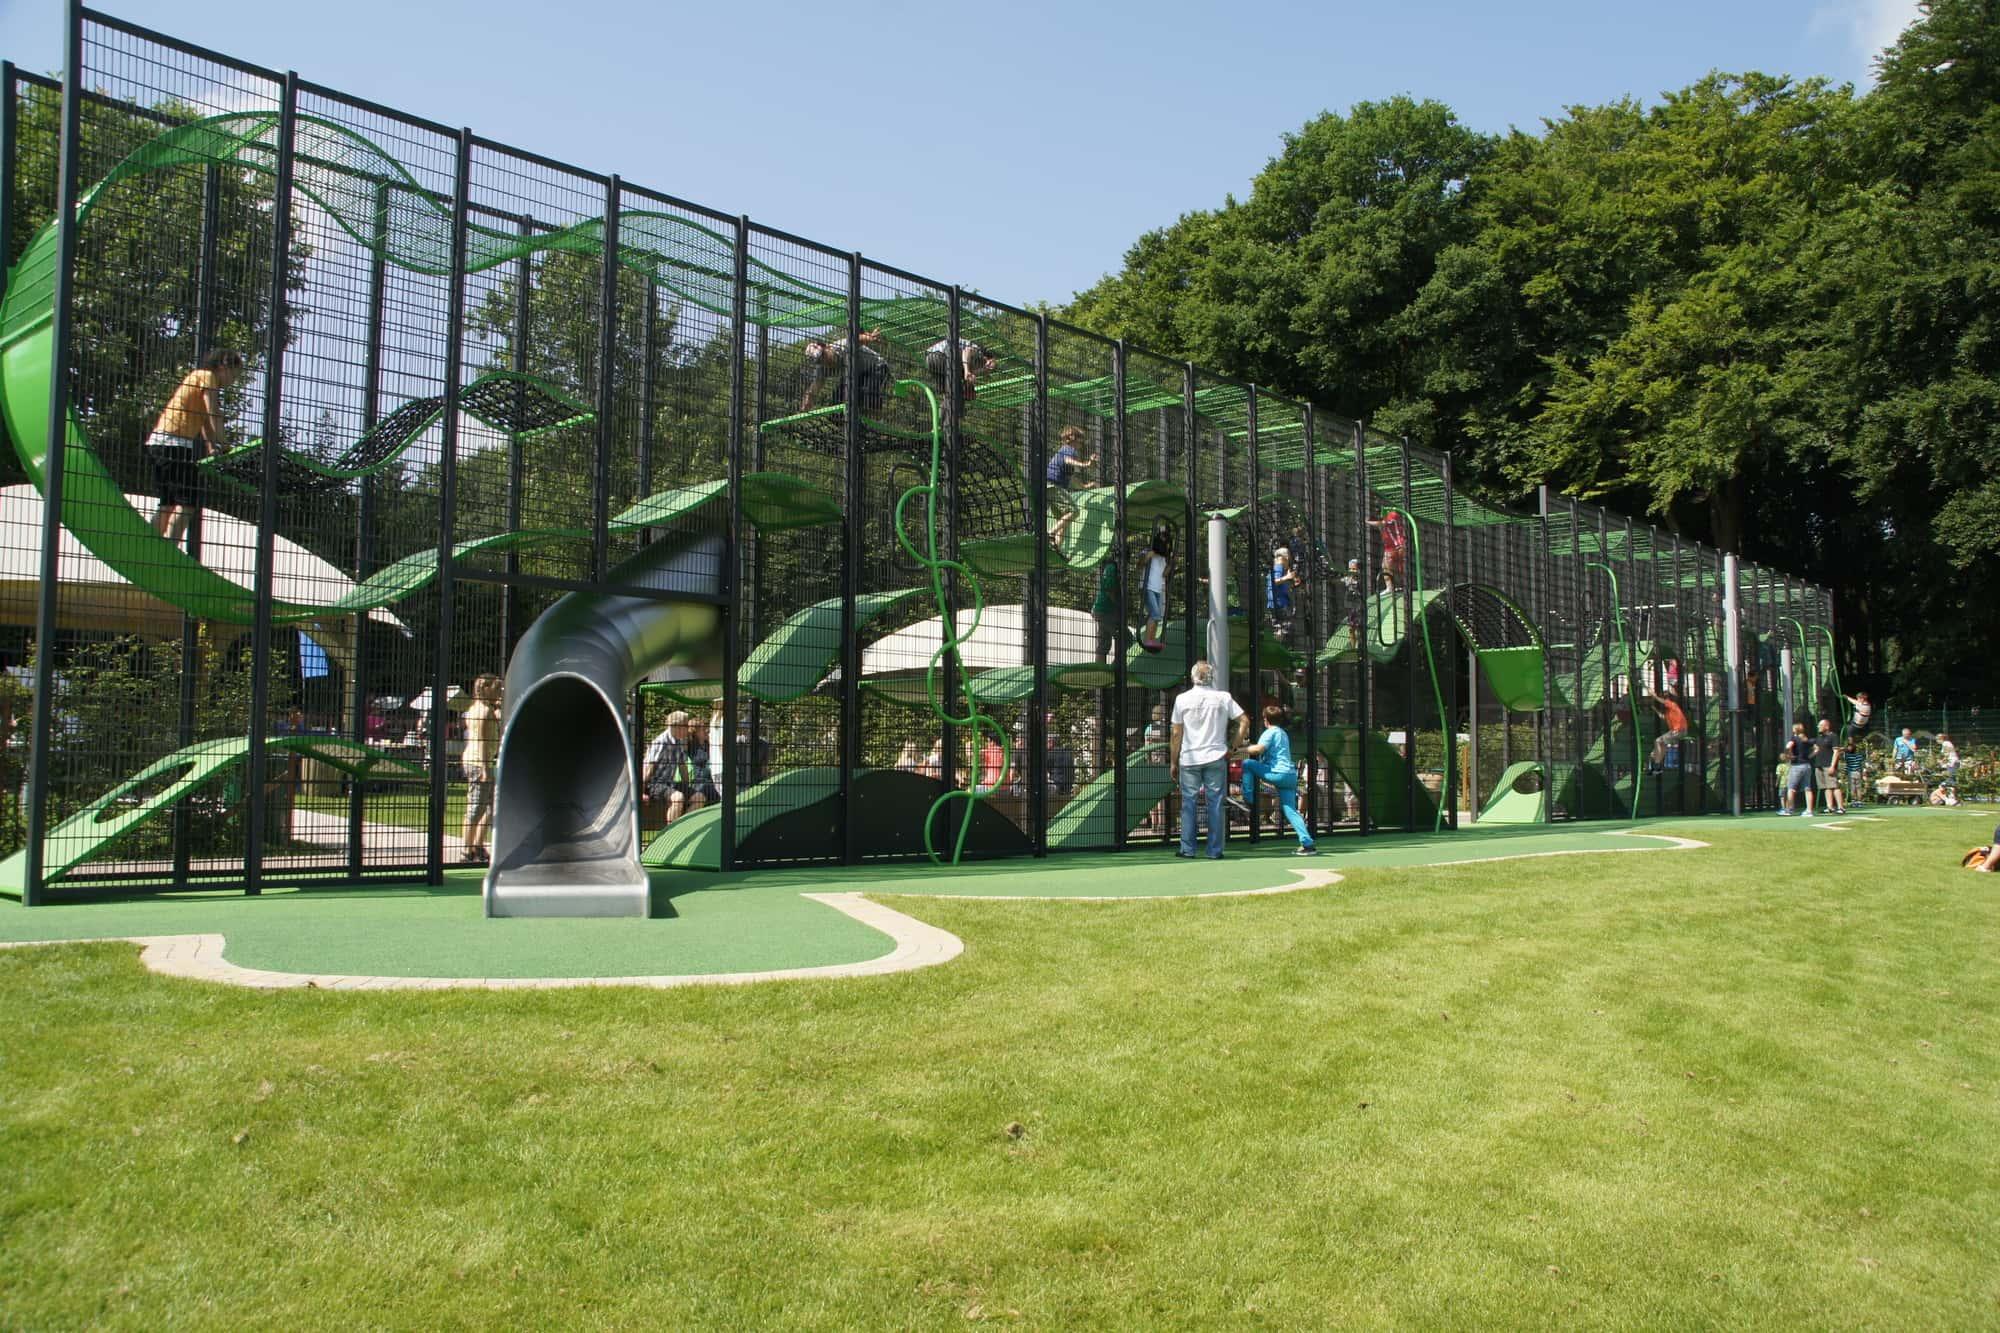 Wallholla playground